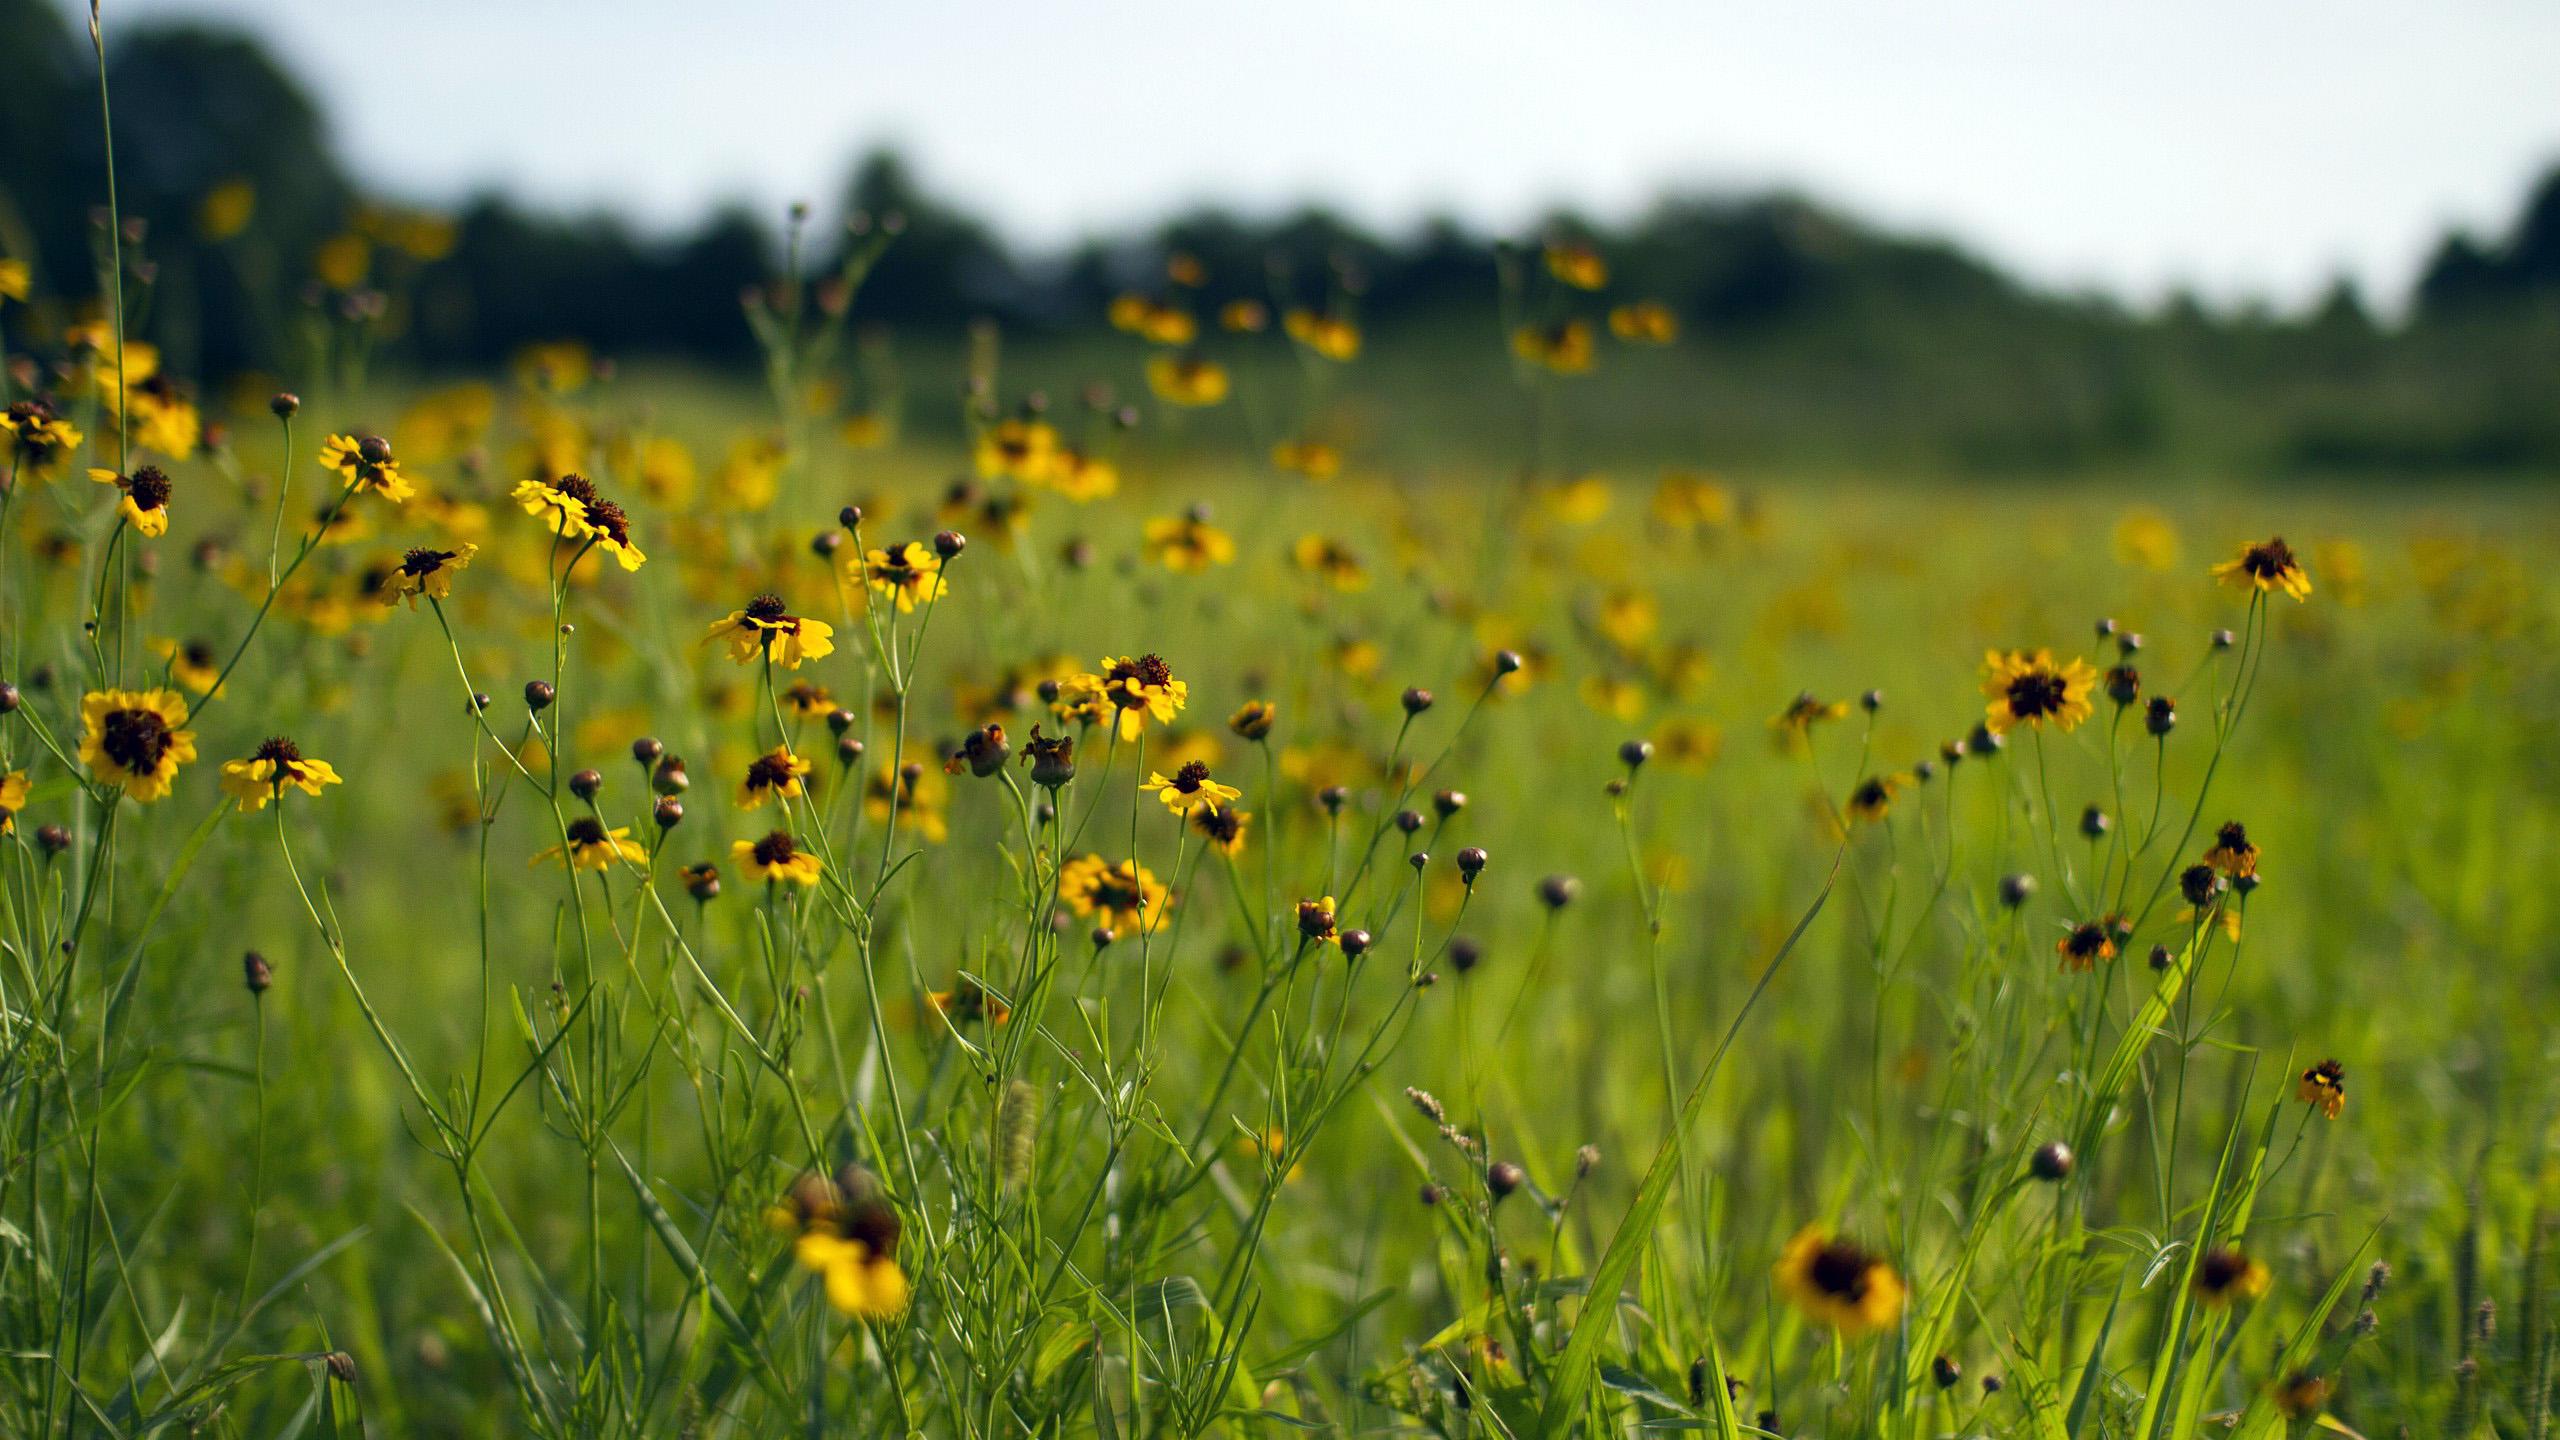 HDoboi.Kiev.ua - обои начало лета, лето, цветы, поляна, зелень, природа, времена года